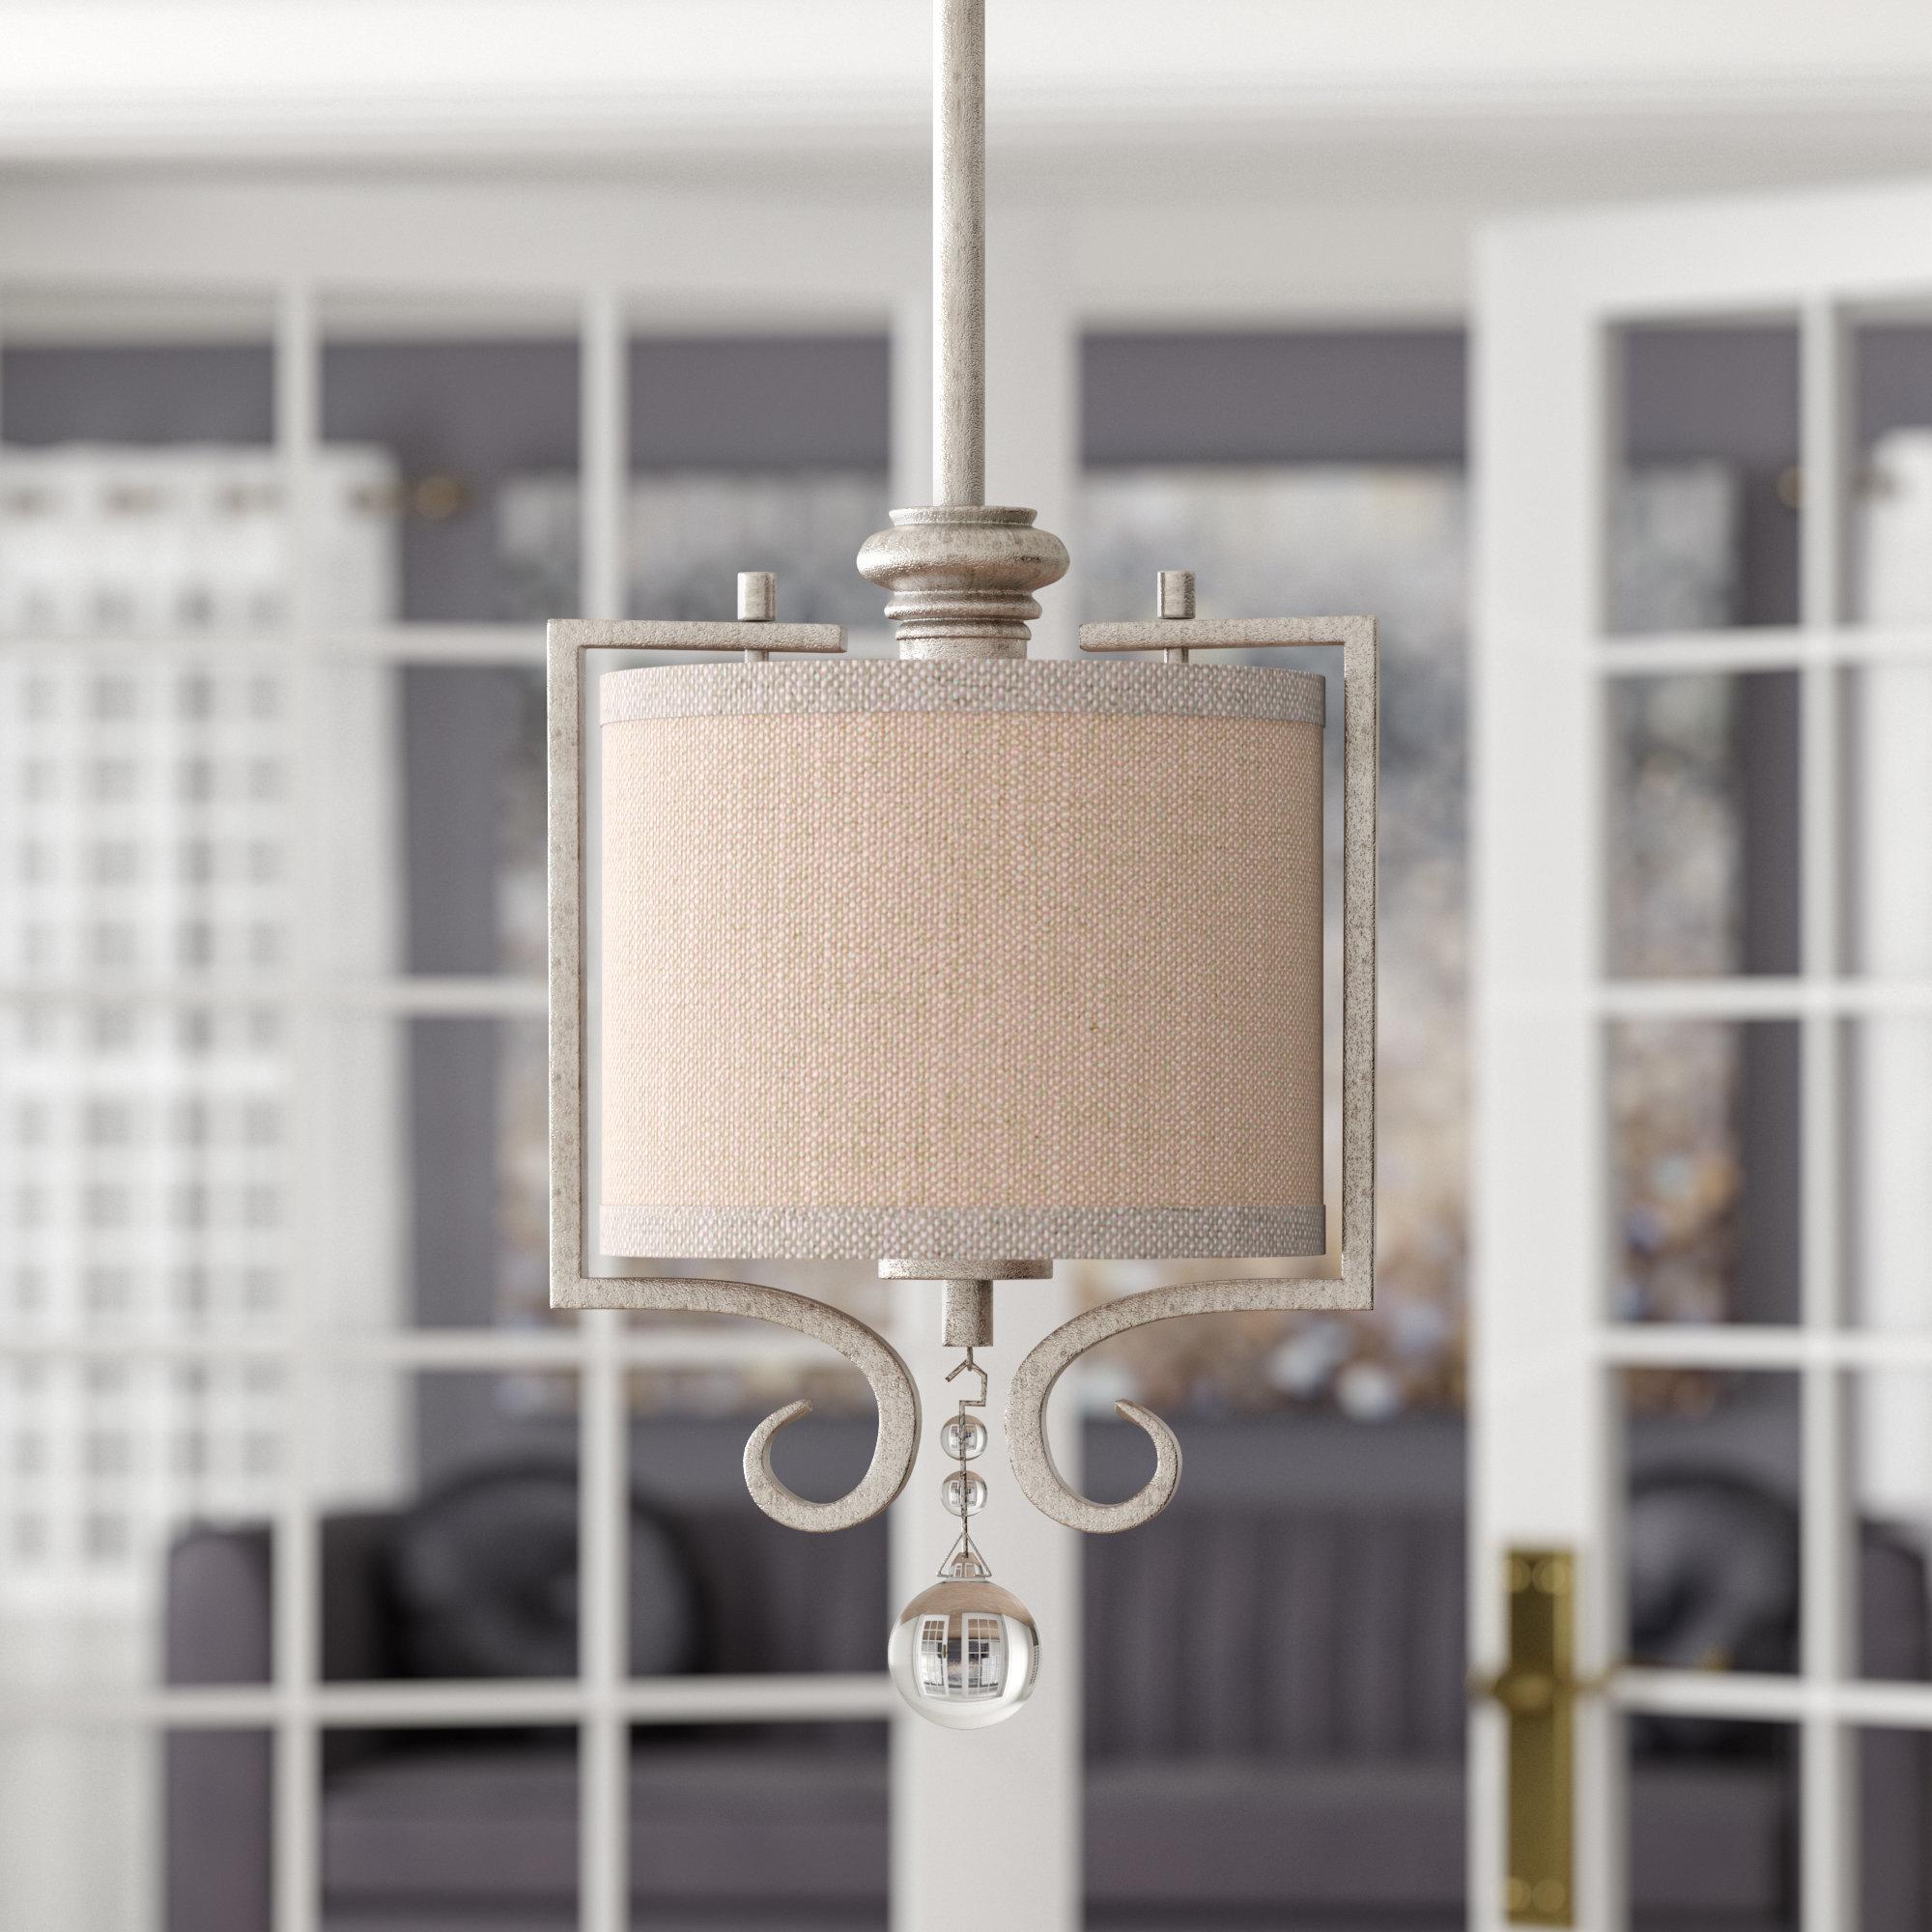 Beasley 1 Light Drum Pendant With Fashionable Kraker 1 Light Single Cylinder Pendants (Gallery 7 of 20)